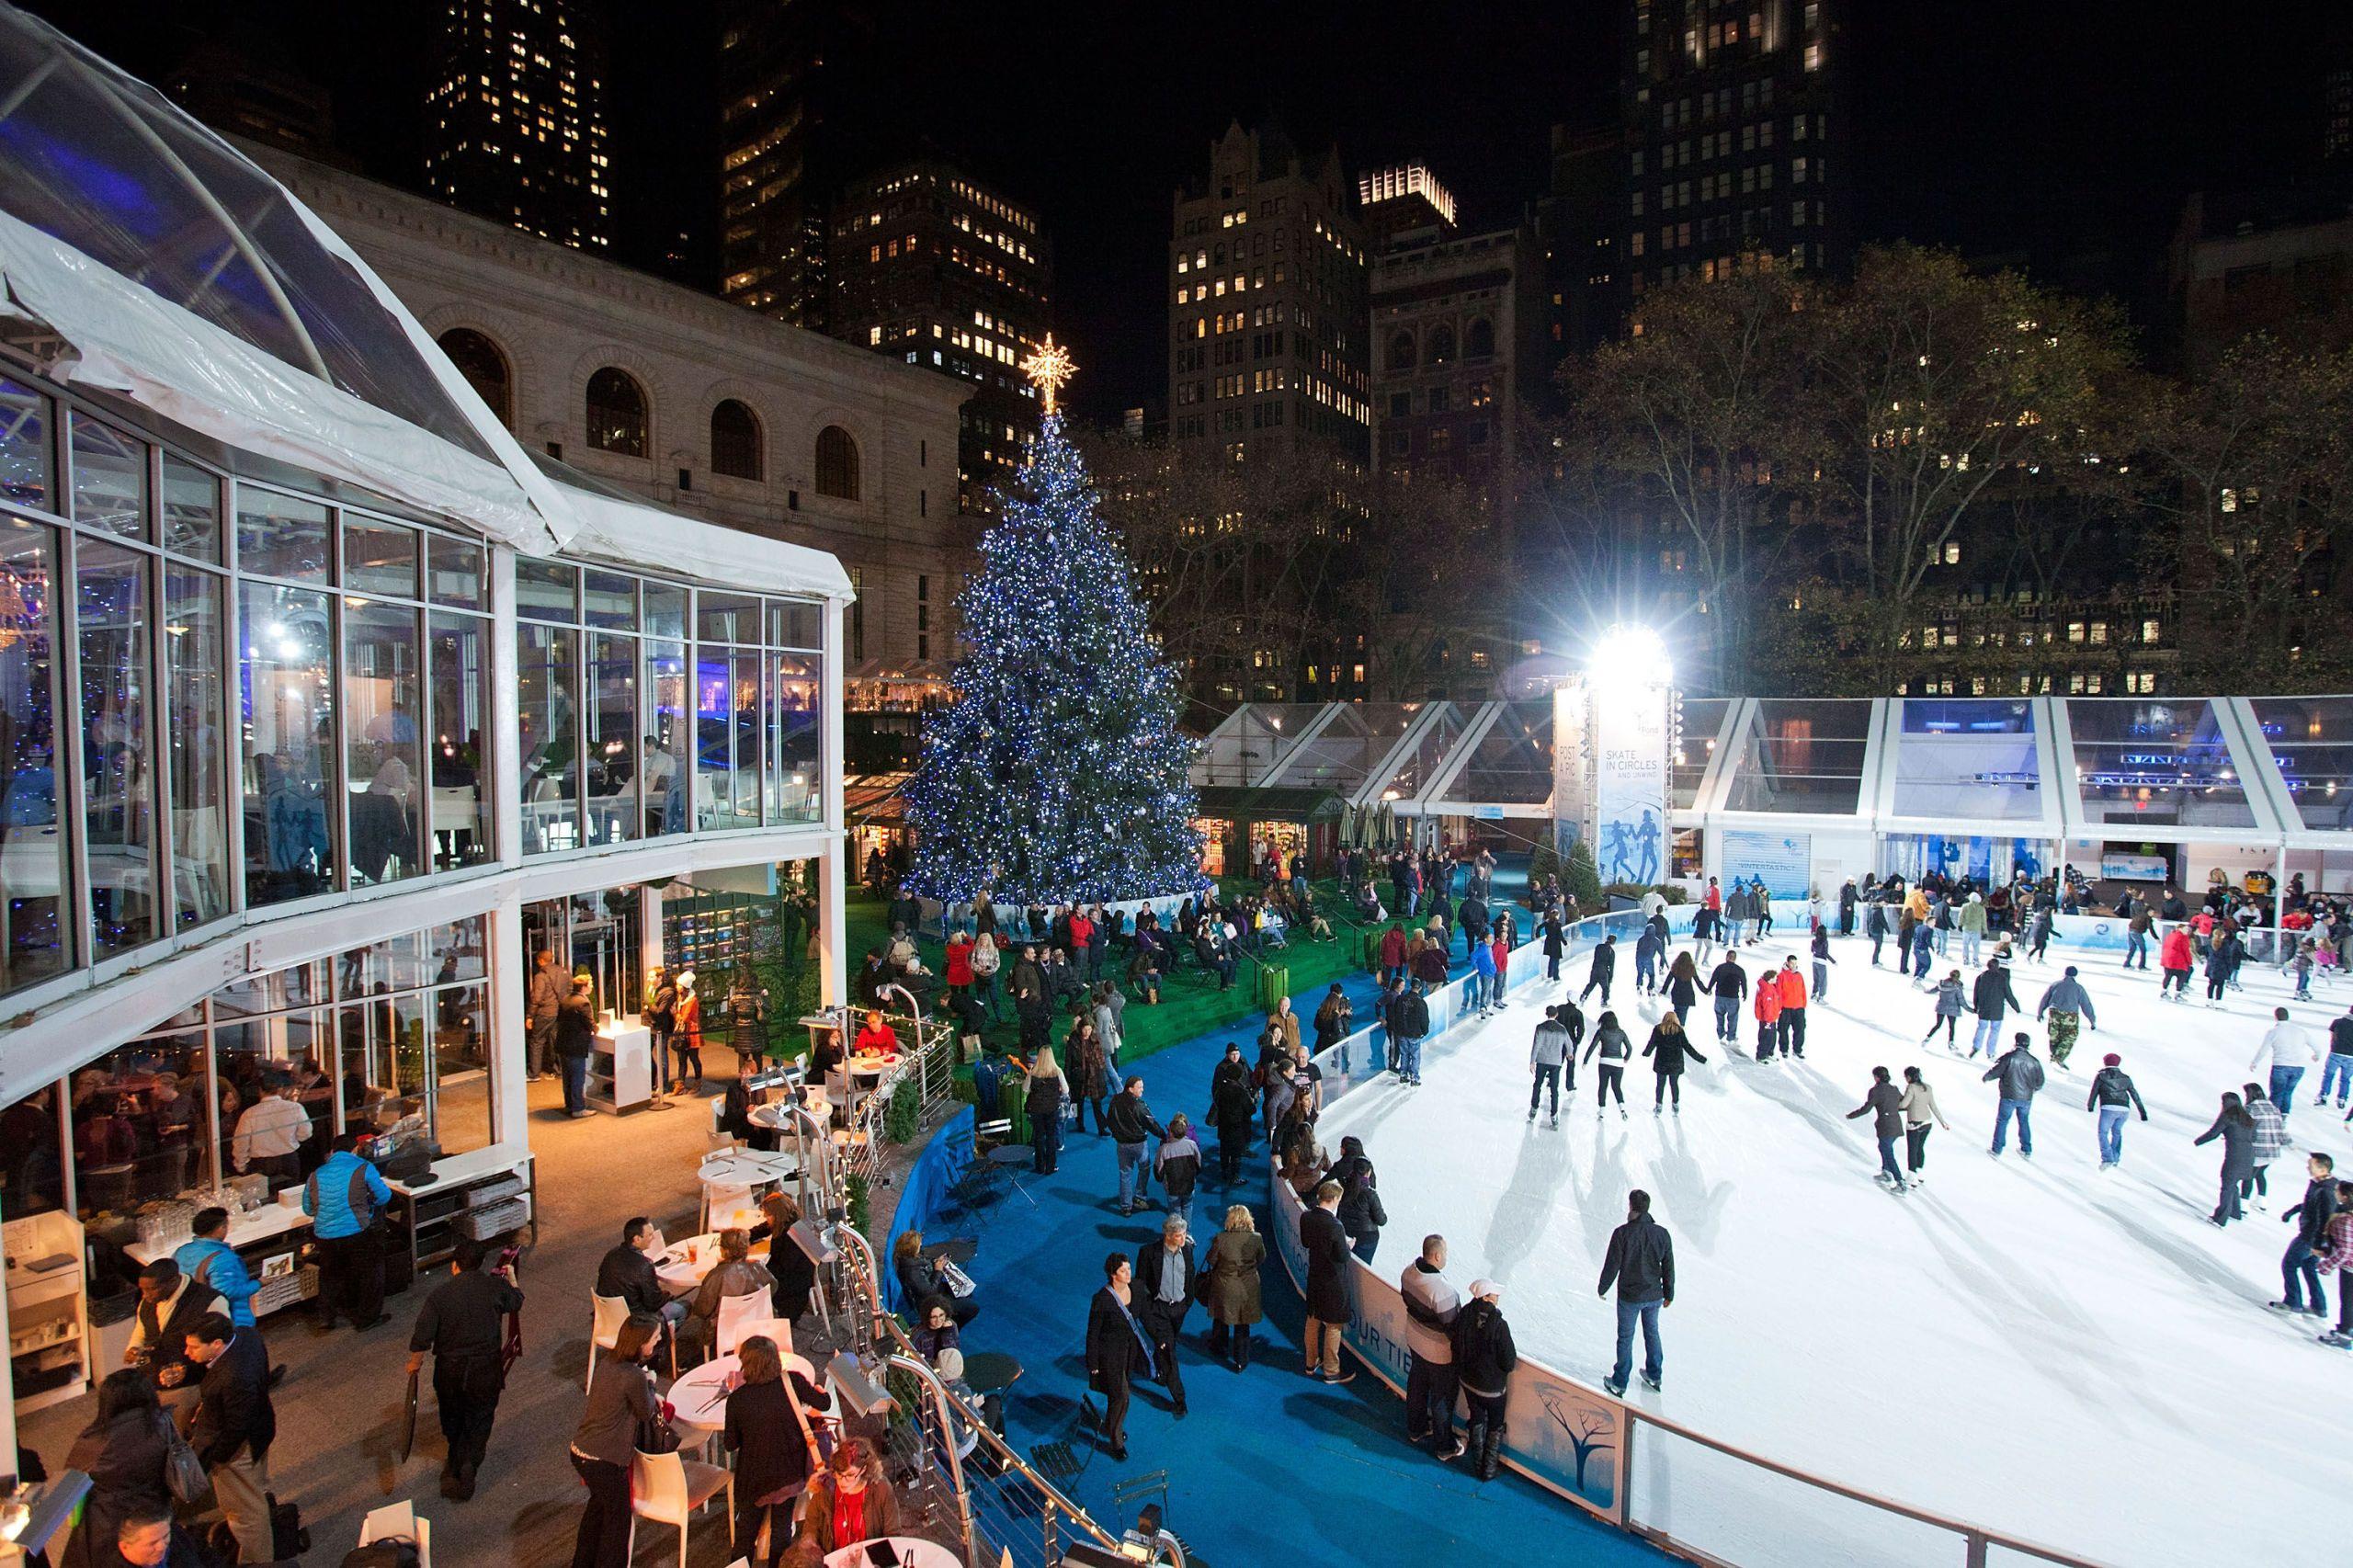 nyc christmas events 2019 - Cried.asesoramiweb.com